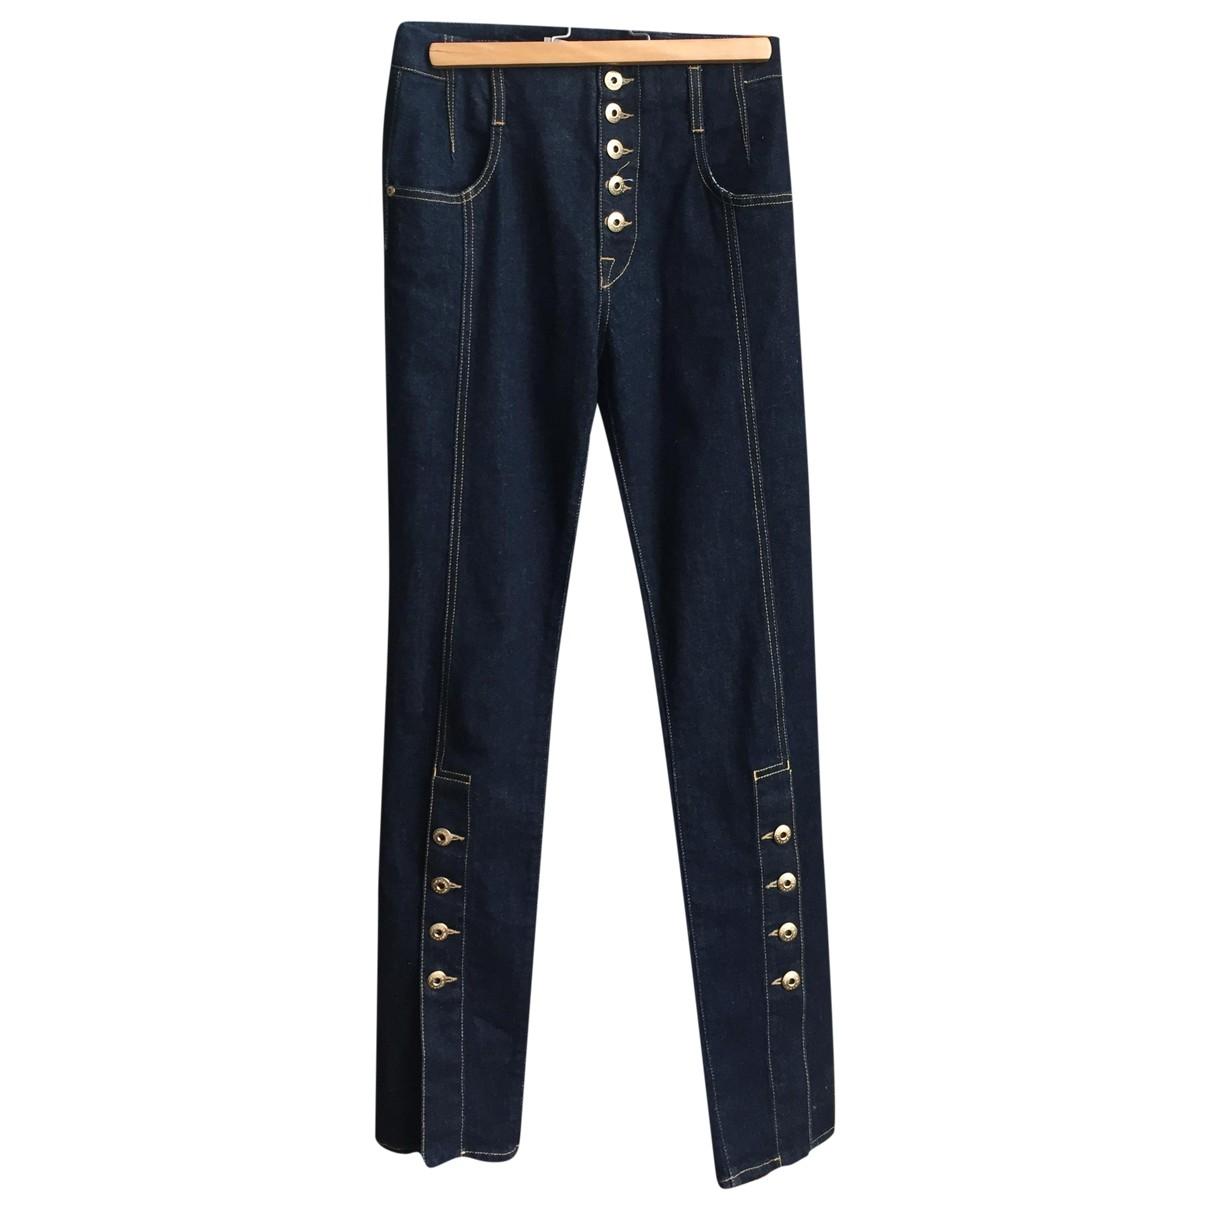 Jonathan Simkhai \N Blue Denim - Jeans Jeans for Women 25 US